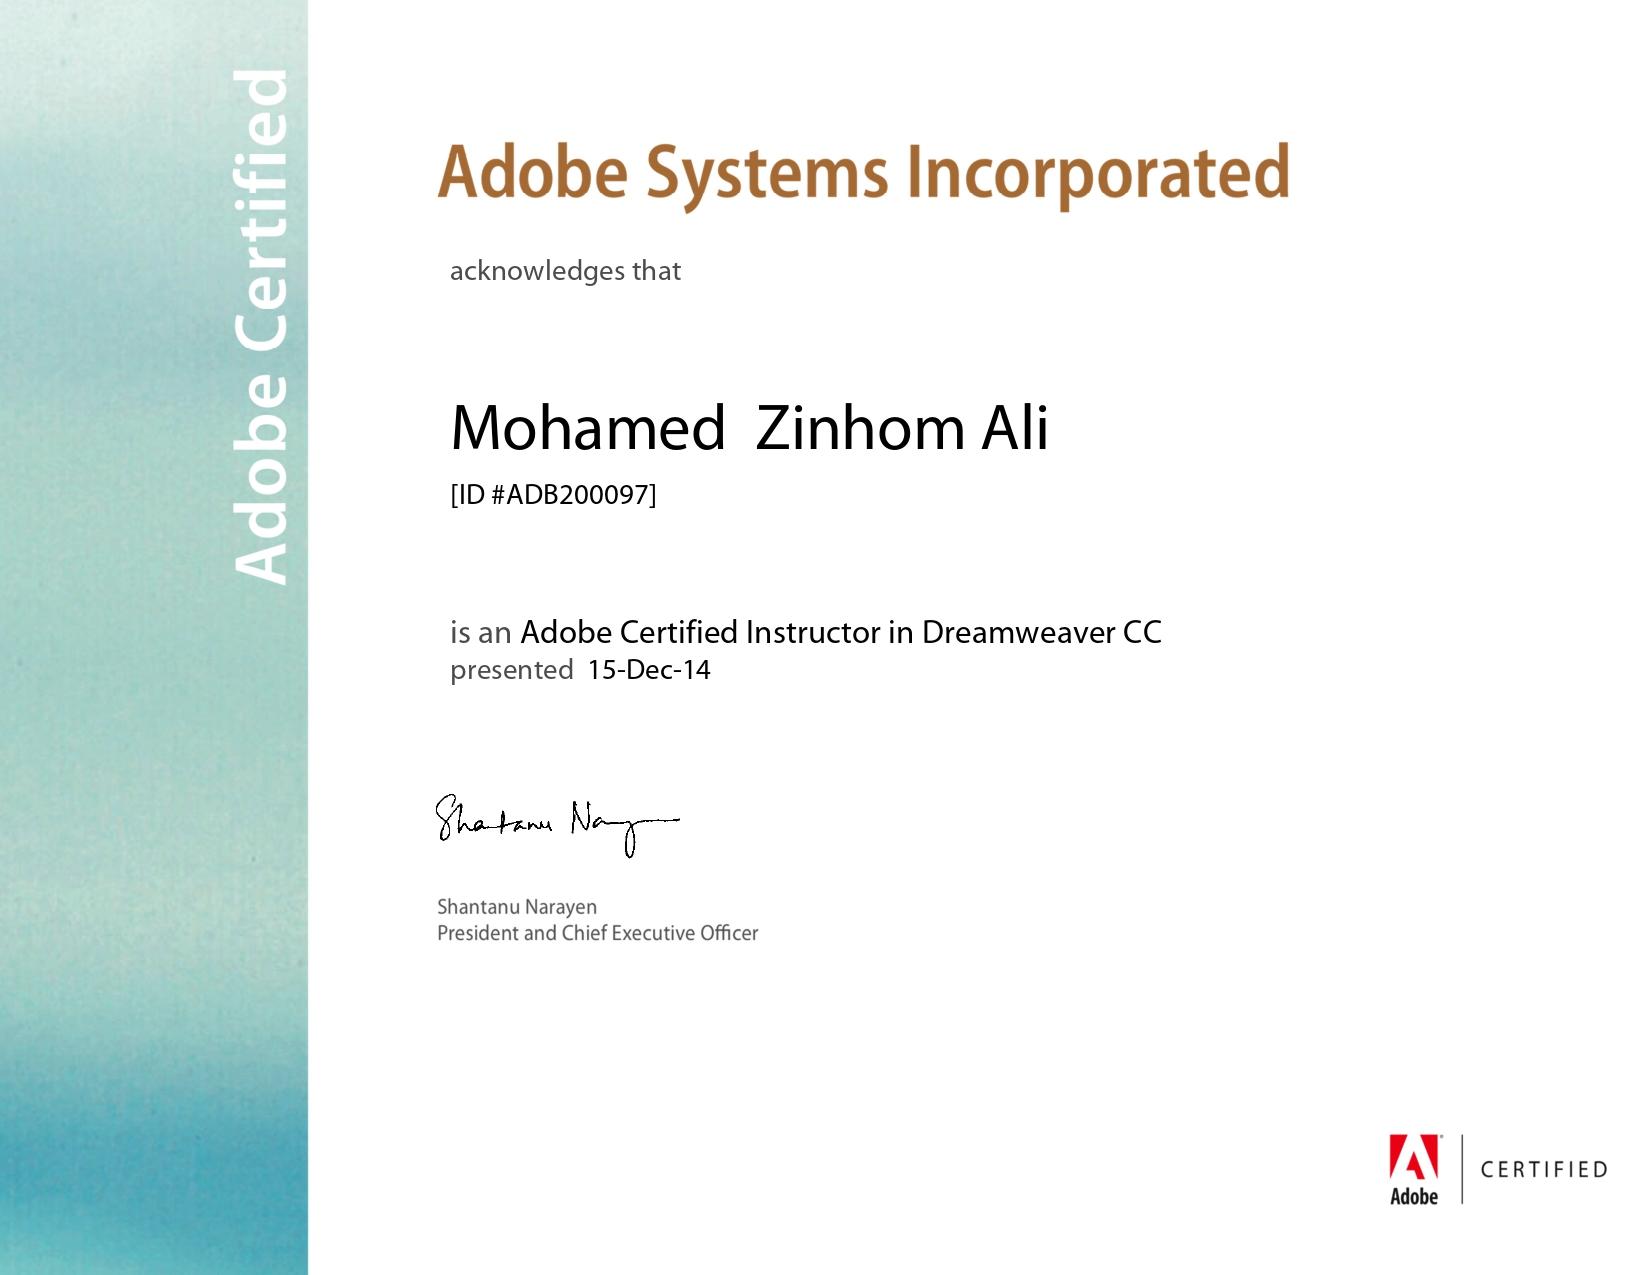 Adobe Certified Instractor Dreamweaver CC